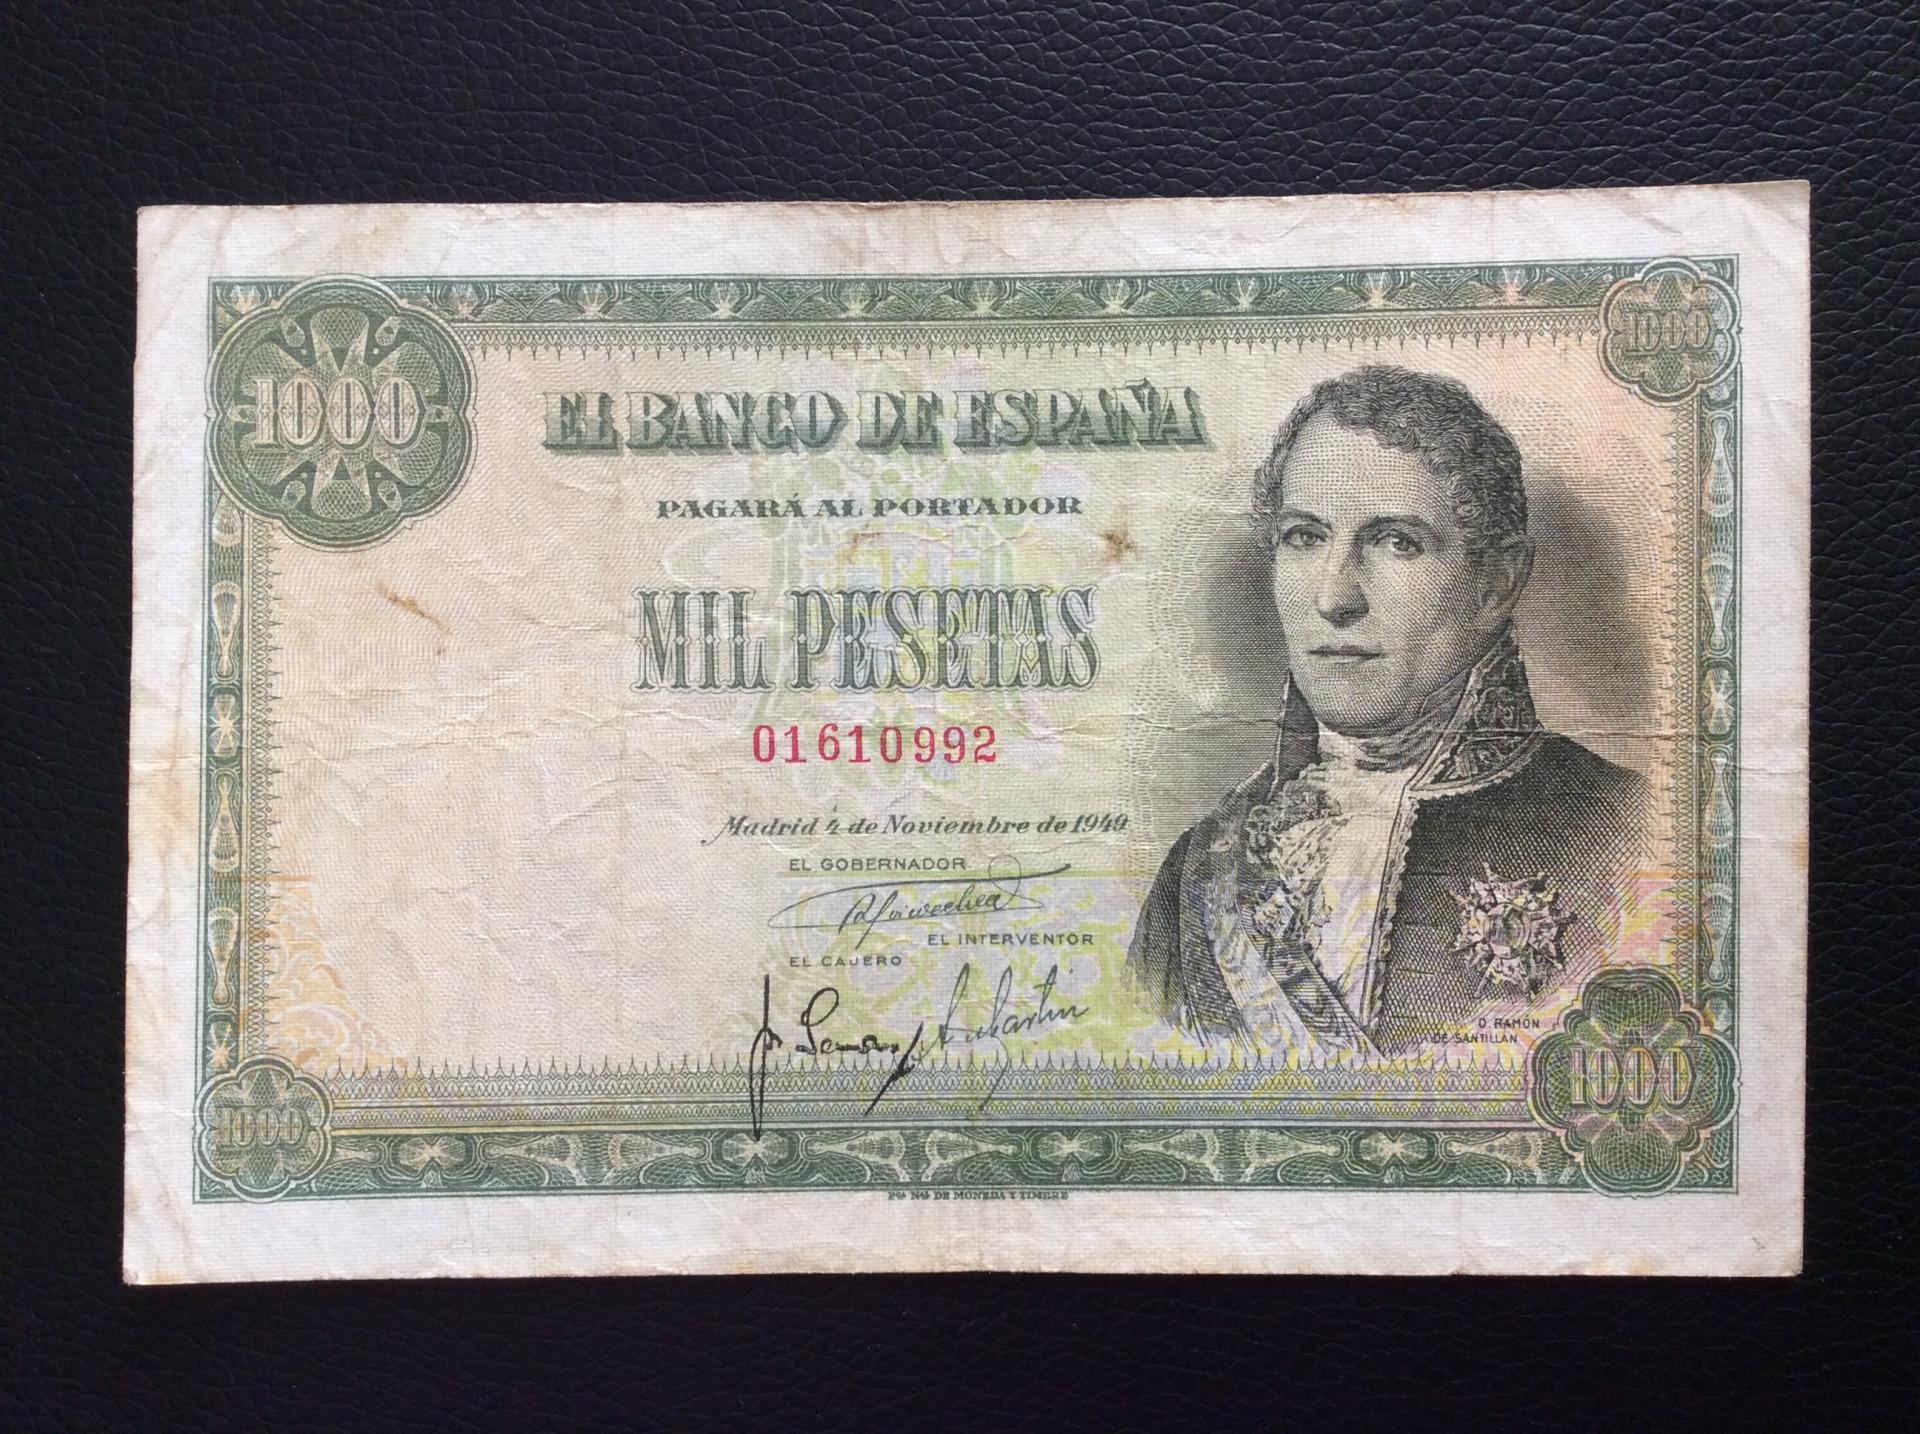 1000 PESETAS 1949 - MARQUÉS DE SANTILLAN